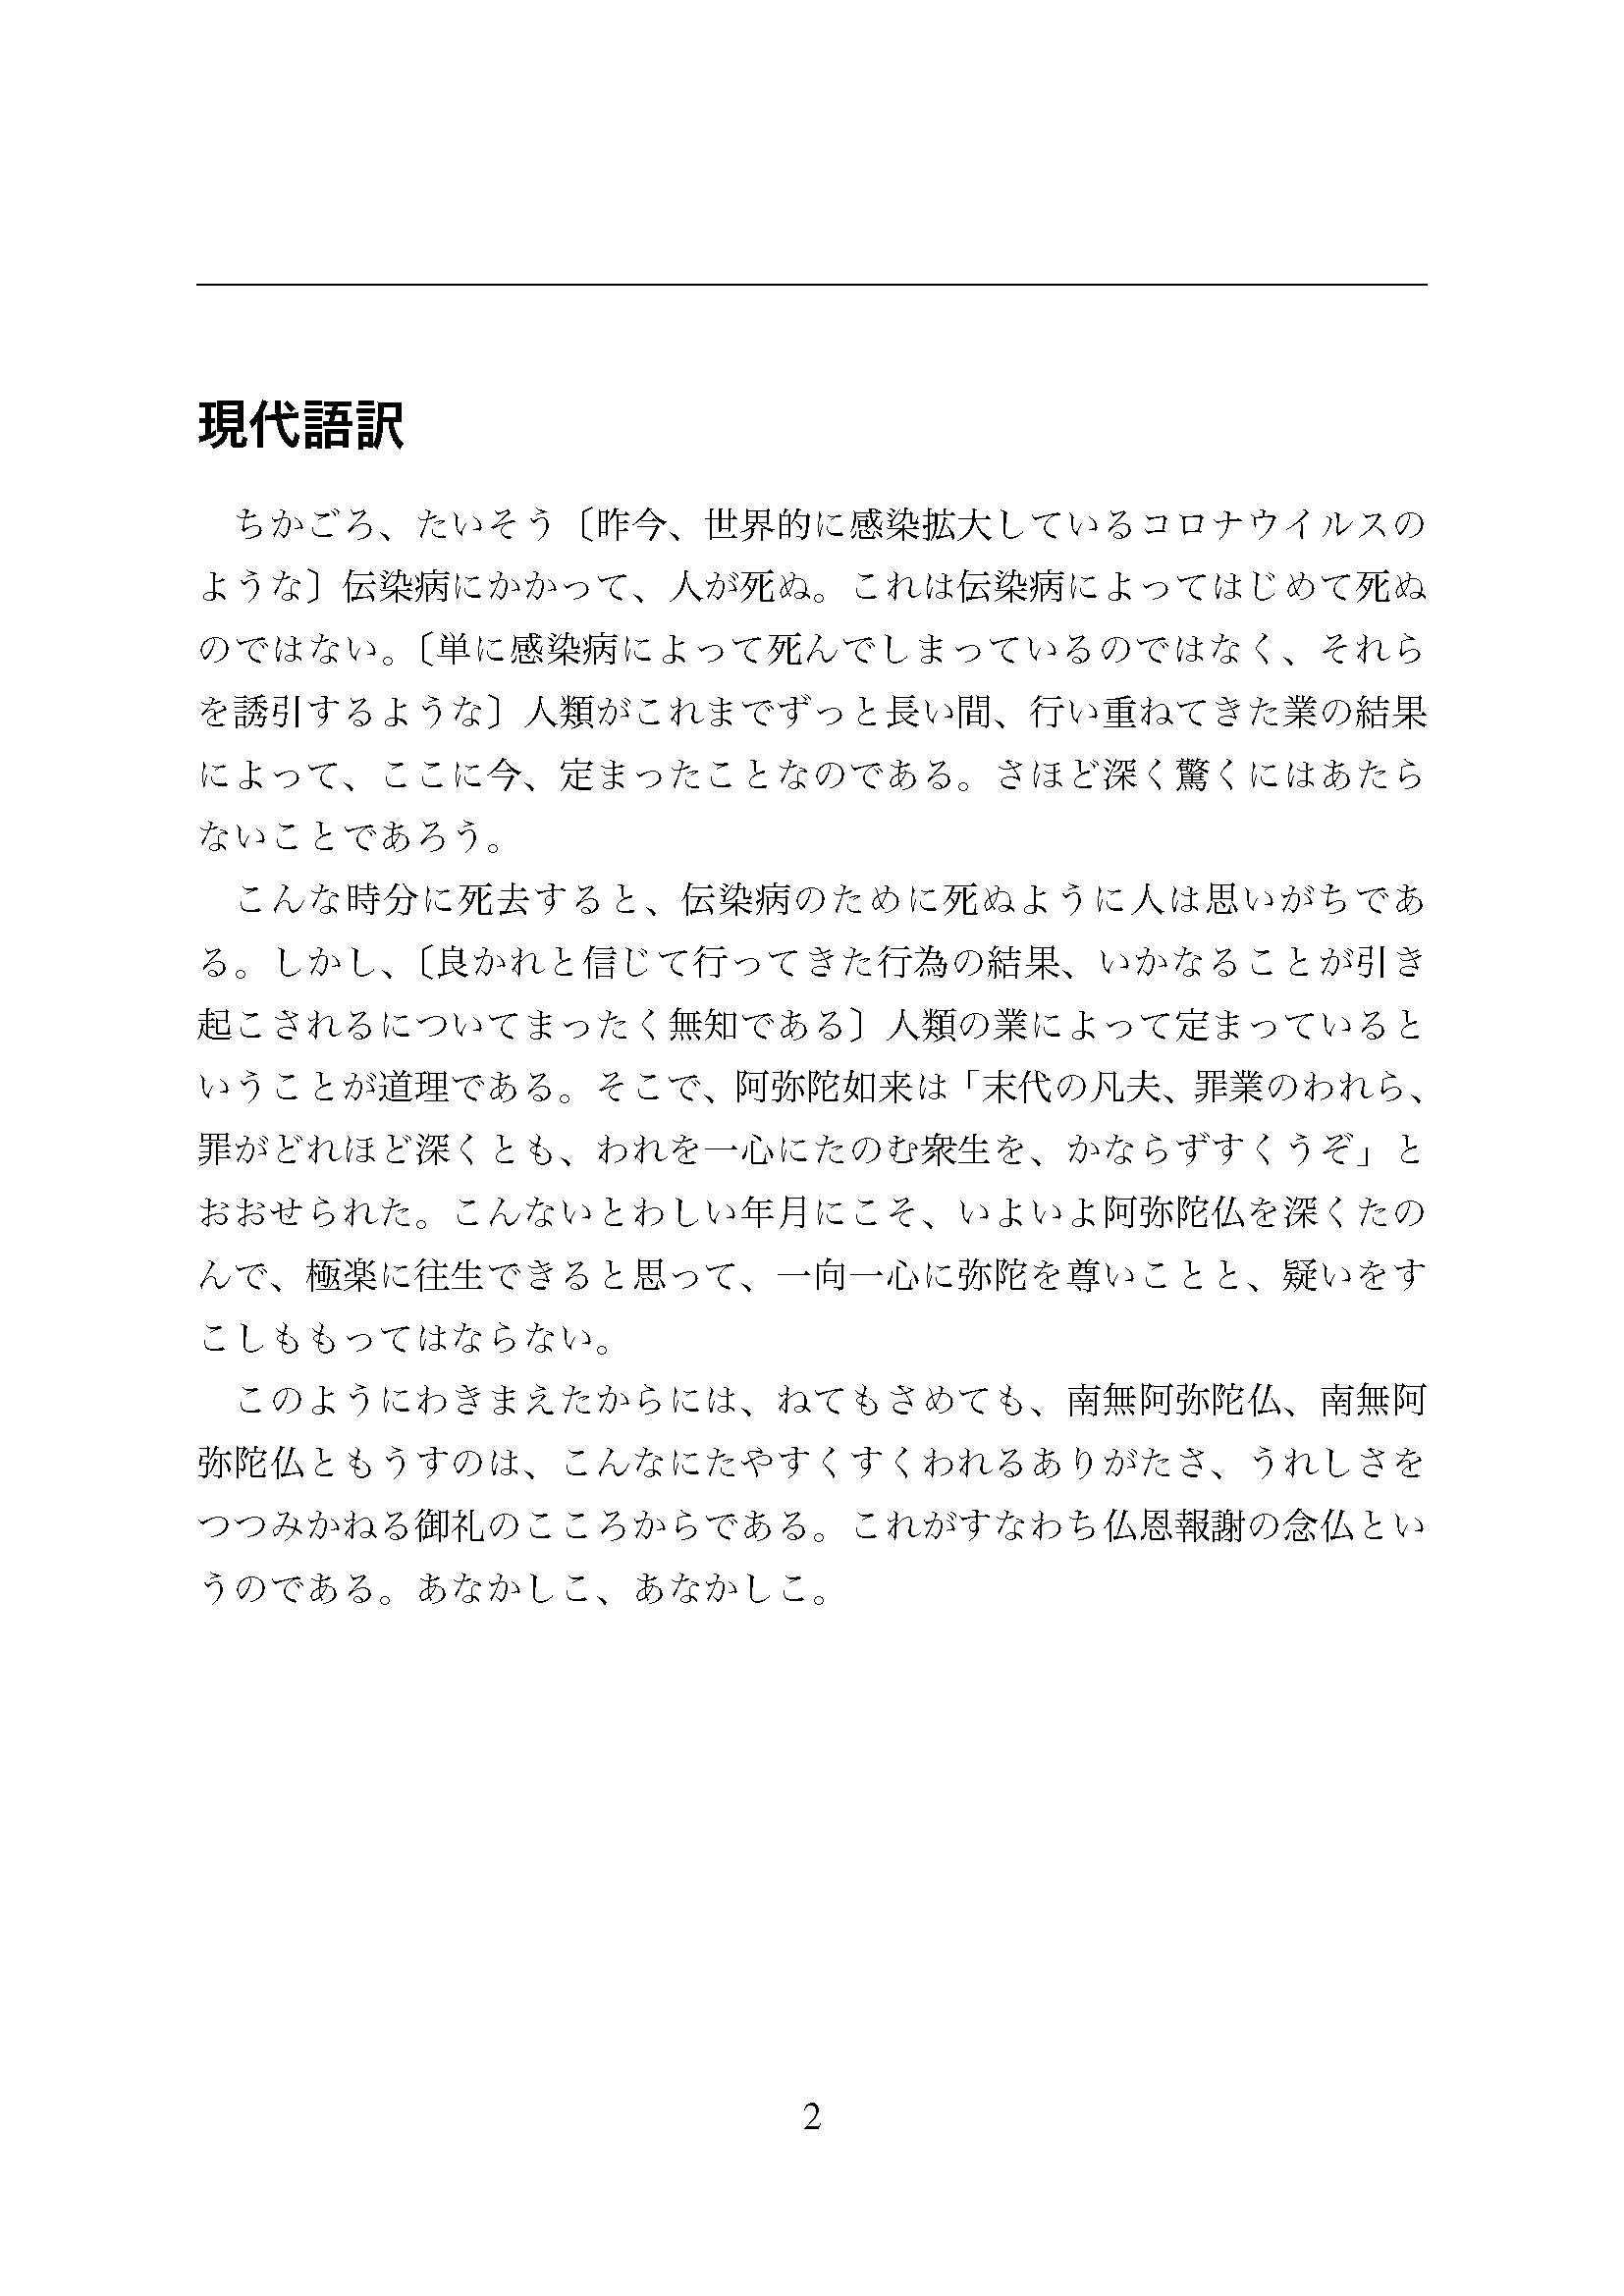 ekirei_new_02.png